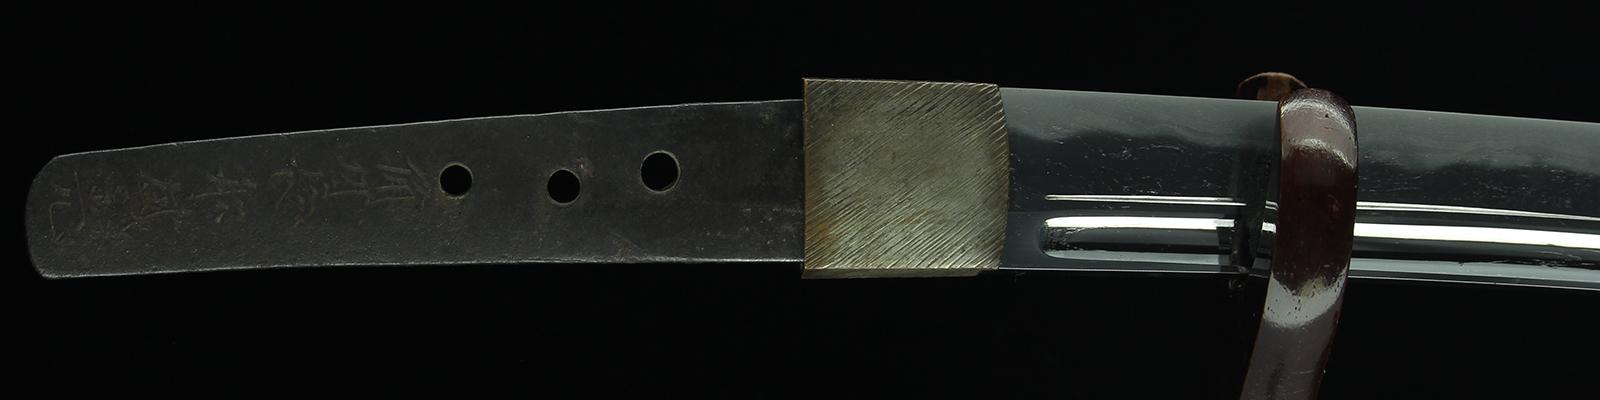 02-2177